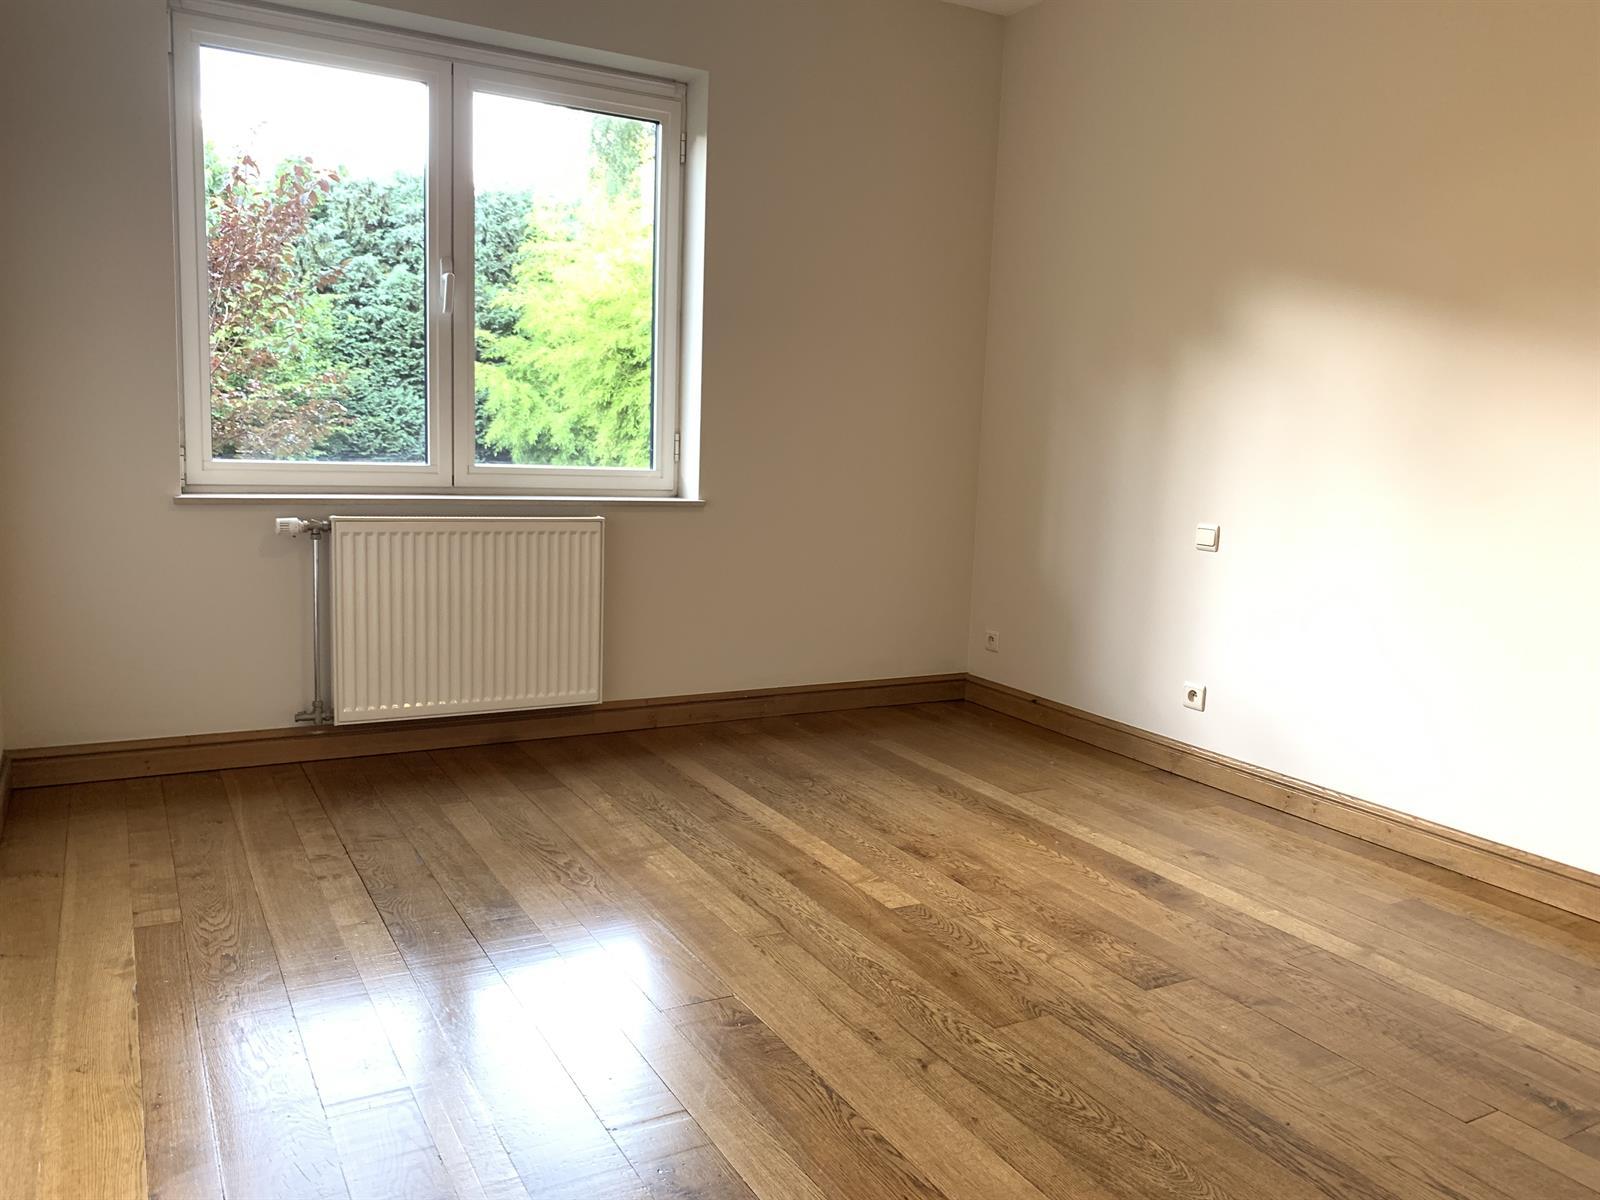 Appartement exceptionnel - Woluwe-Saint-Pierre - #4433539-32